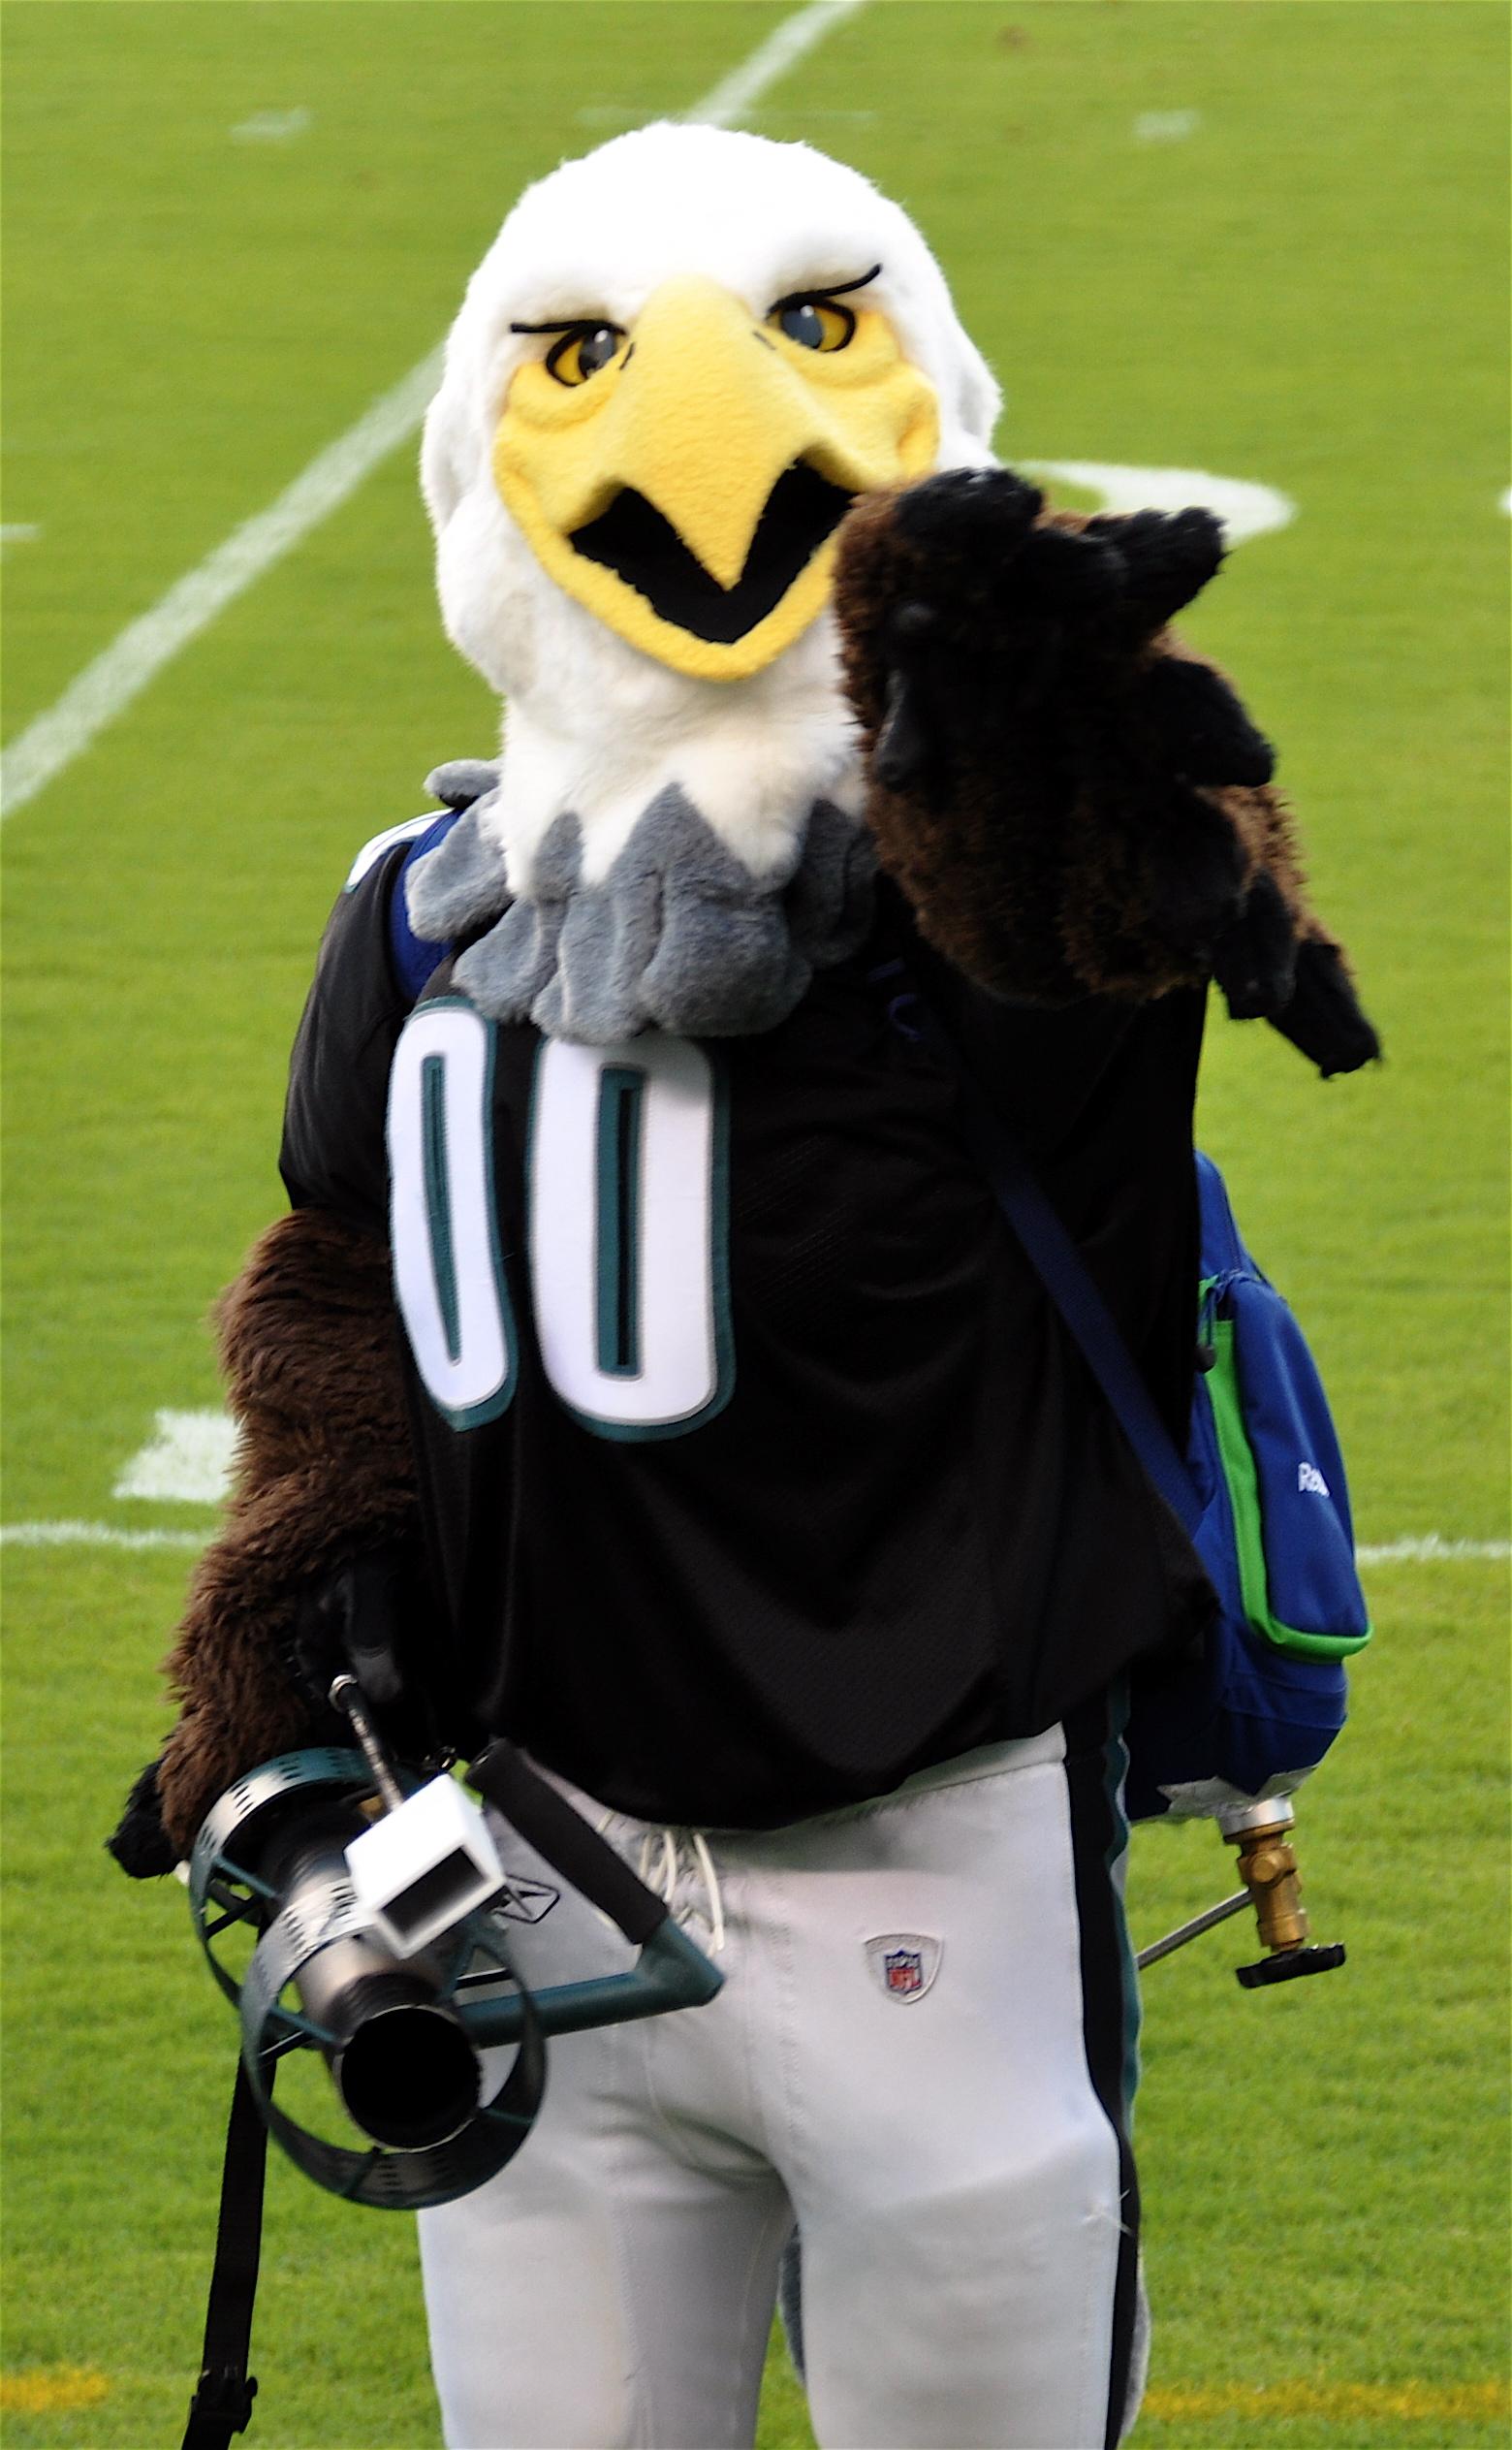 File:Philadelphia Eagles Mascot Swoop.jpg - Wikimedia Commons